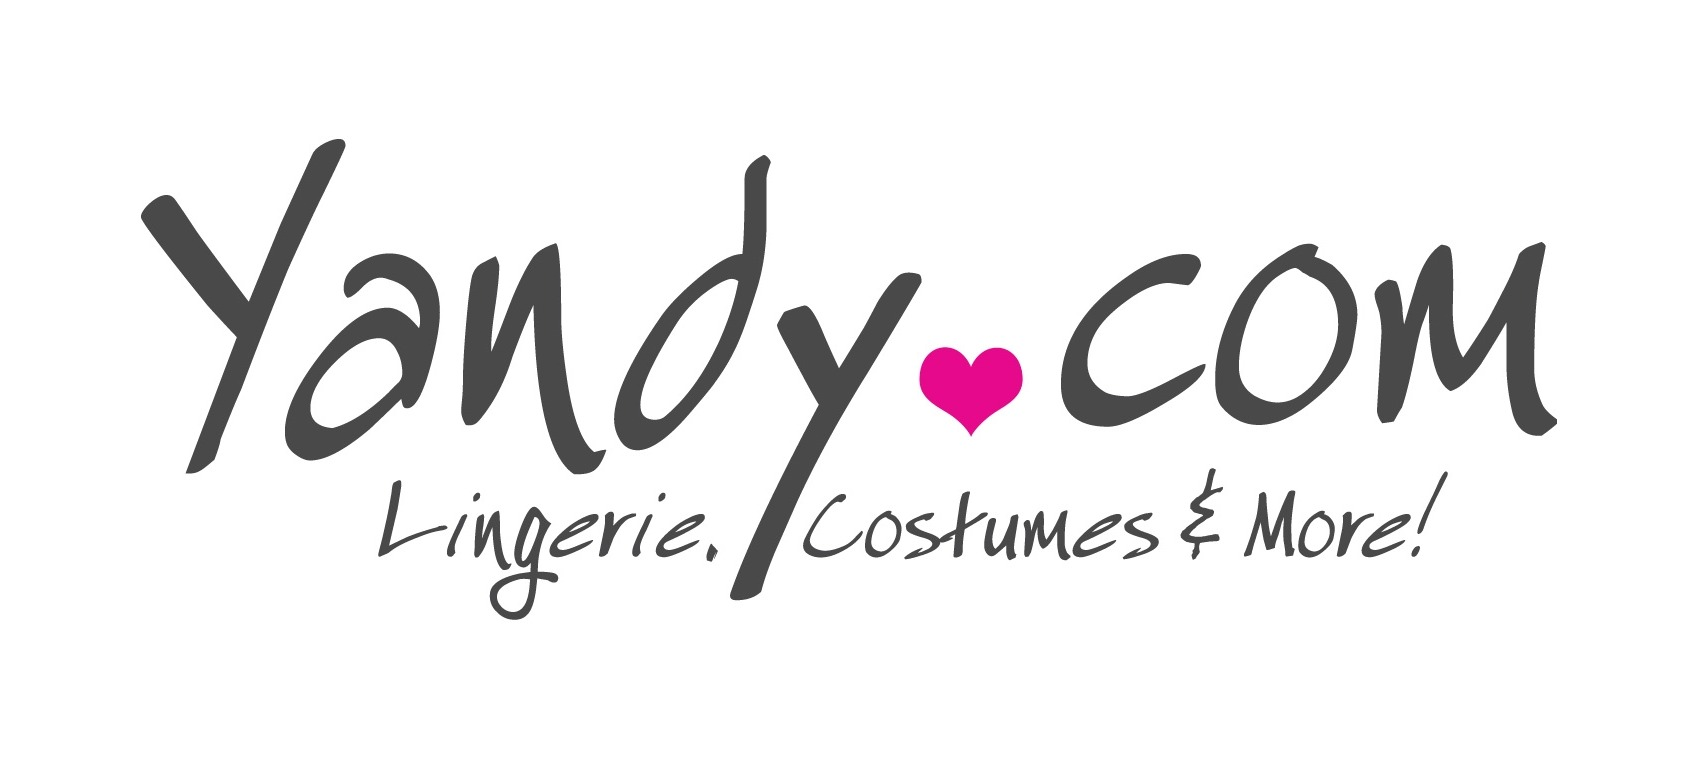 Logo Yandy